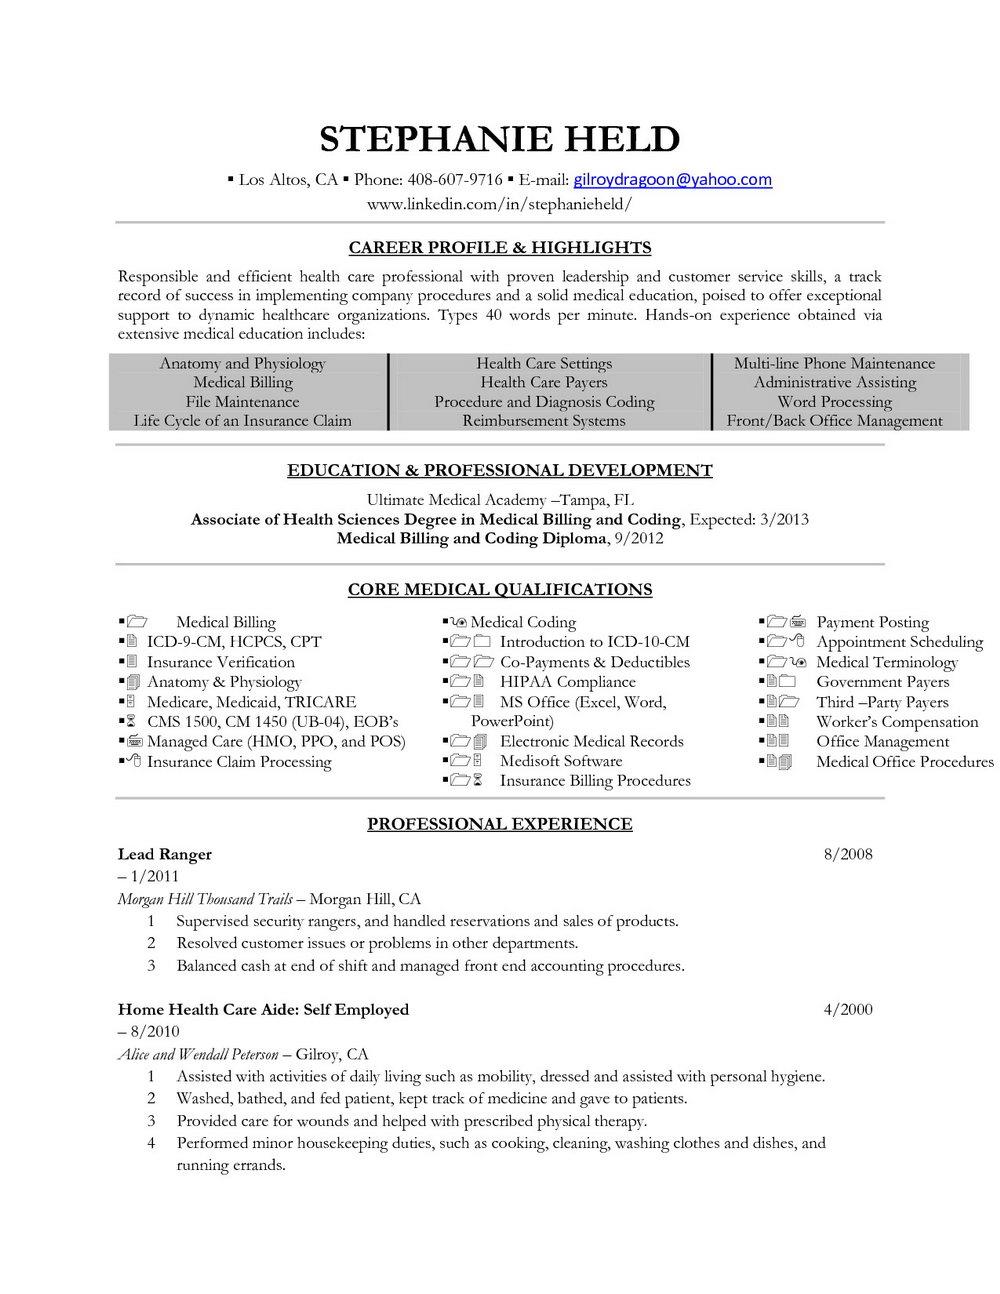 Medical Coding Resume Sample Entry Level